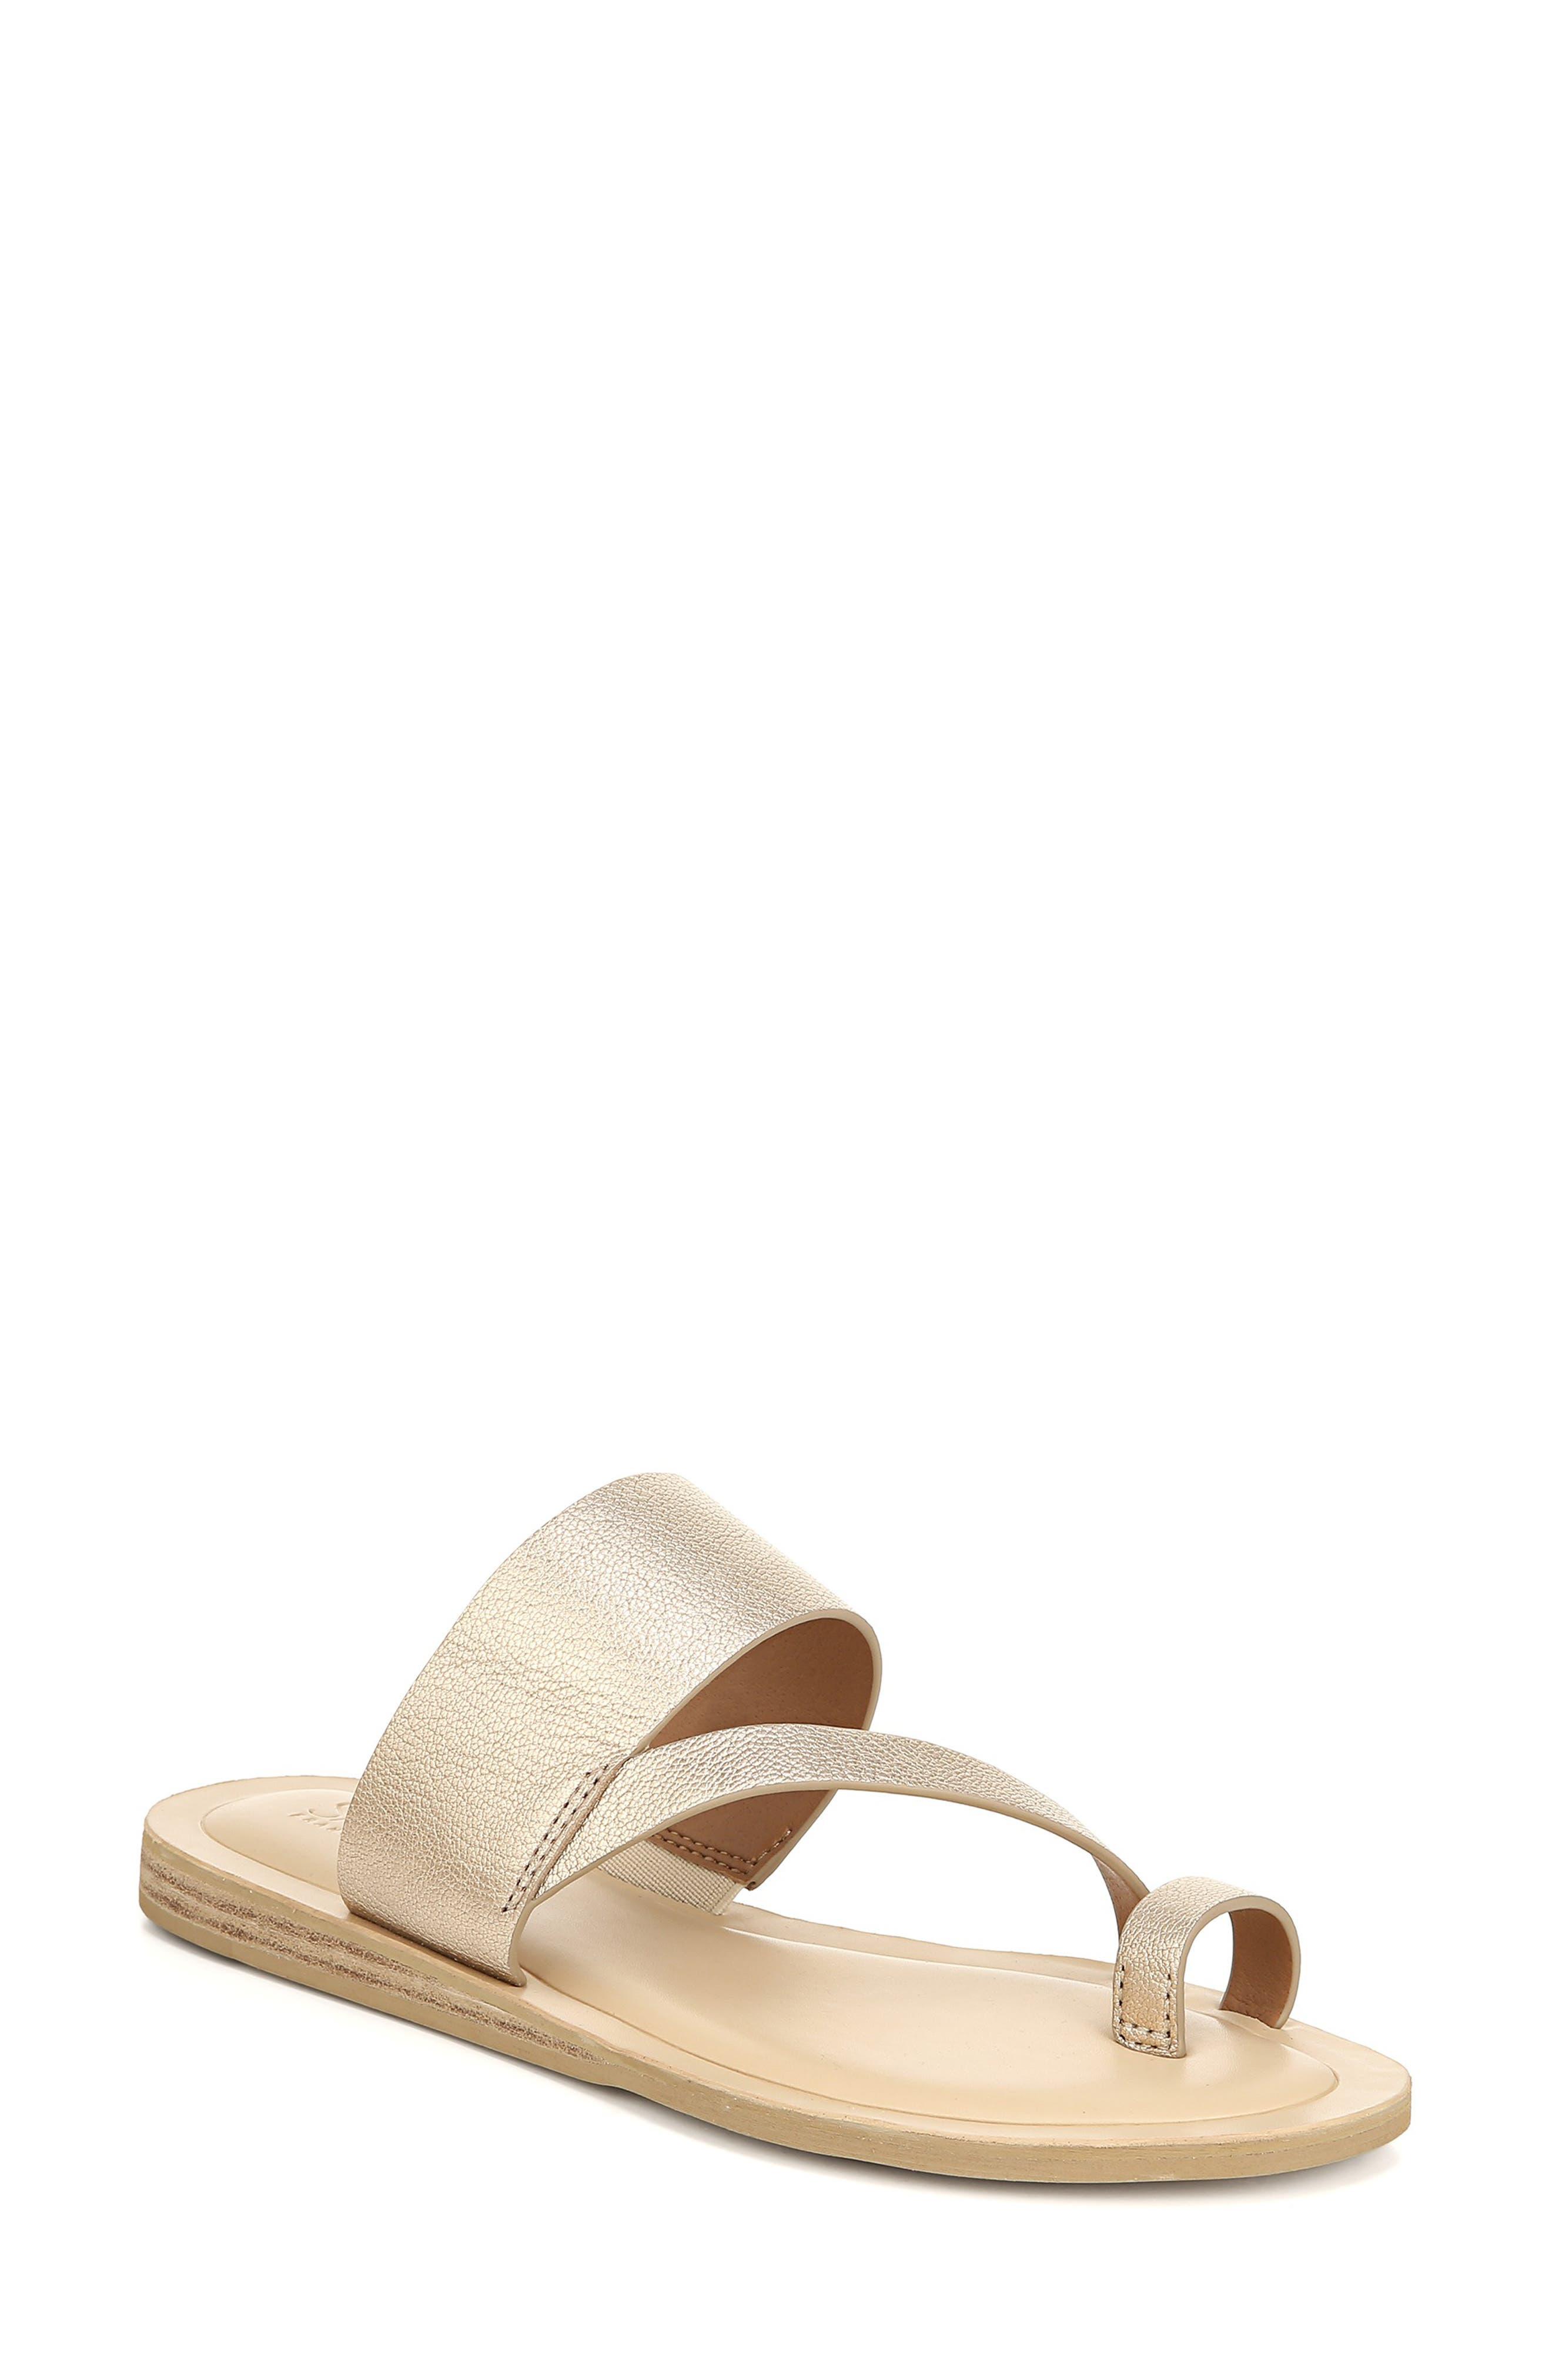 Sarto By Franco Sarto Leila Toe Loop Sandal, Metallic